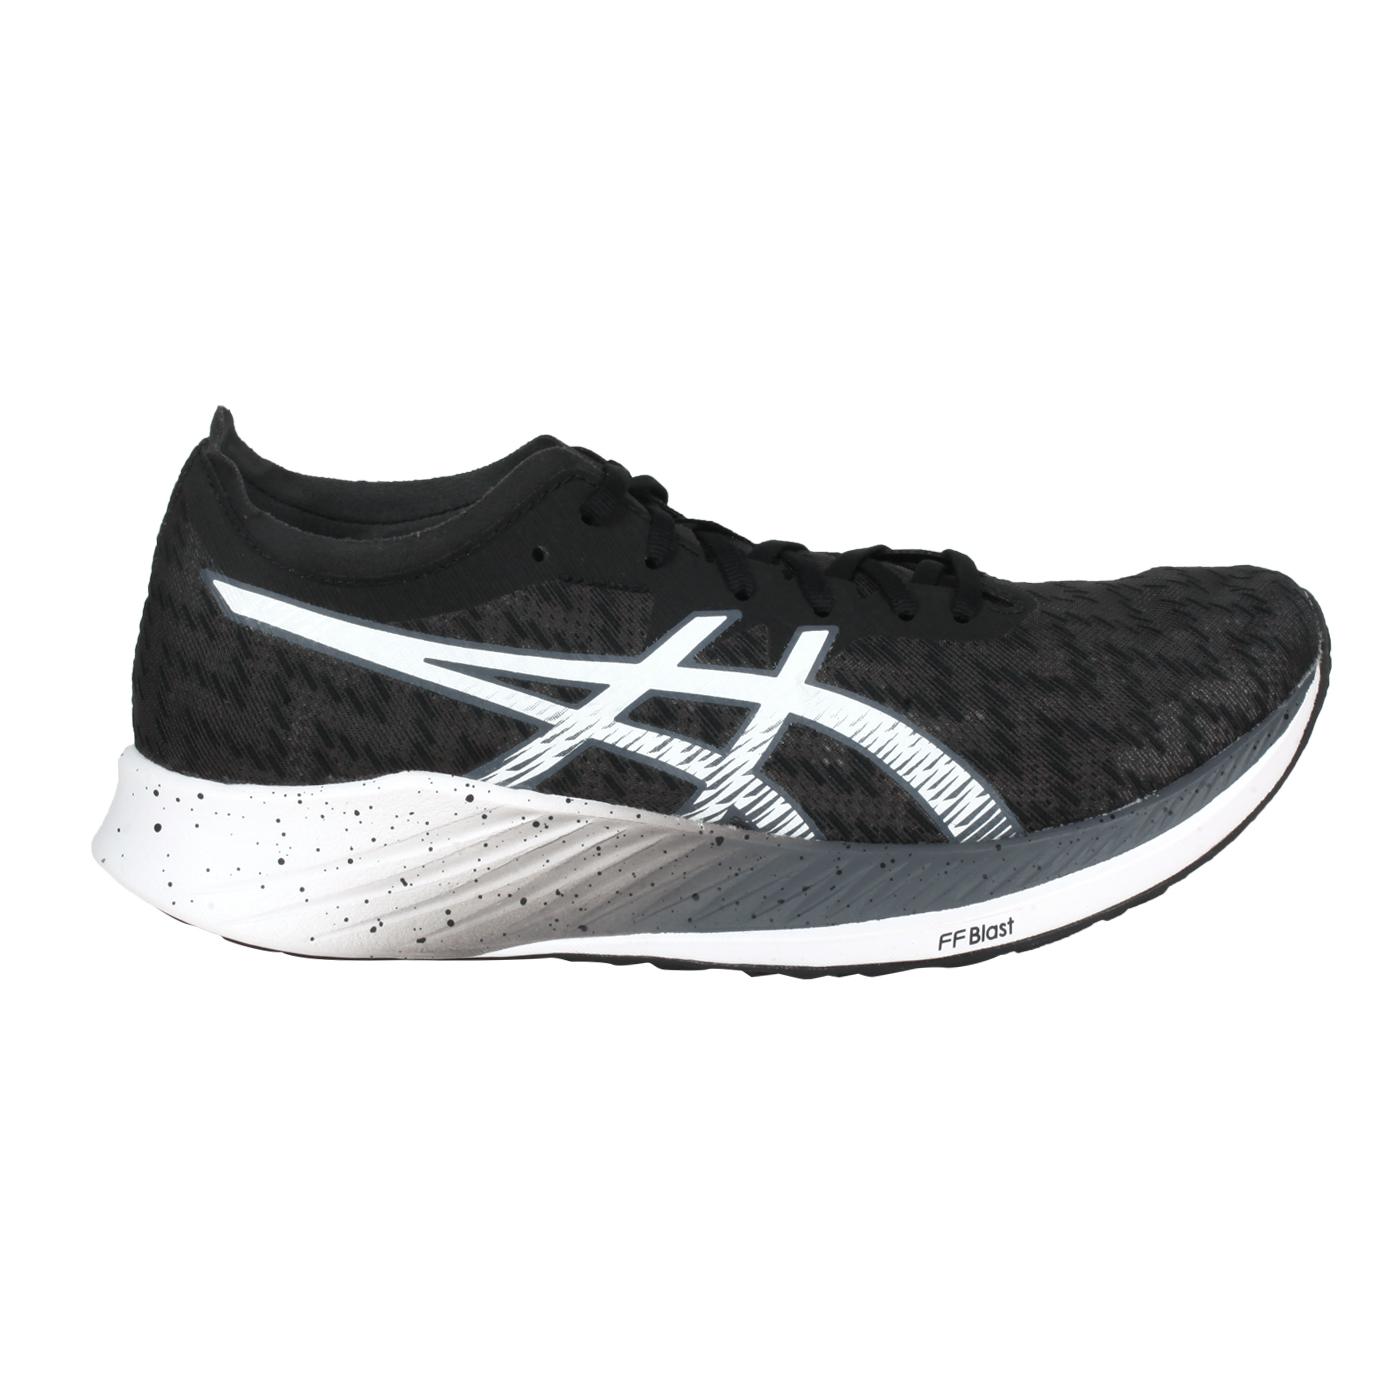 ASICS 限量-男款路跑鞋-2E  @MAGIC SPEED@1011B393-001 - 黑白